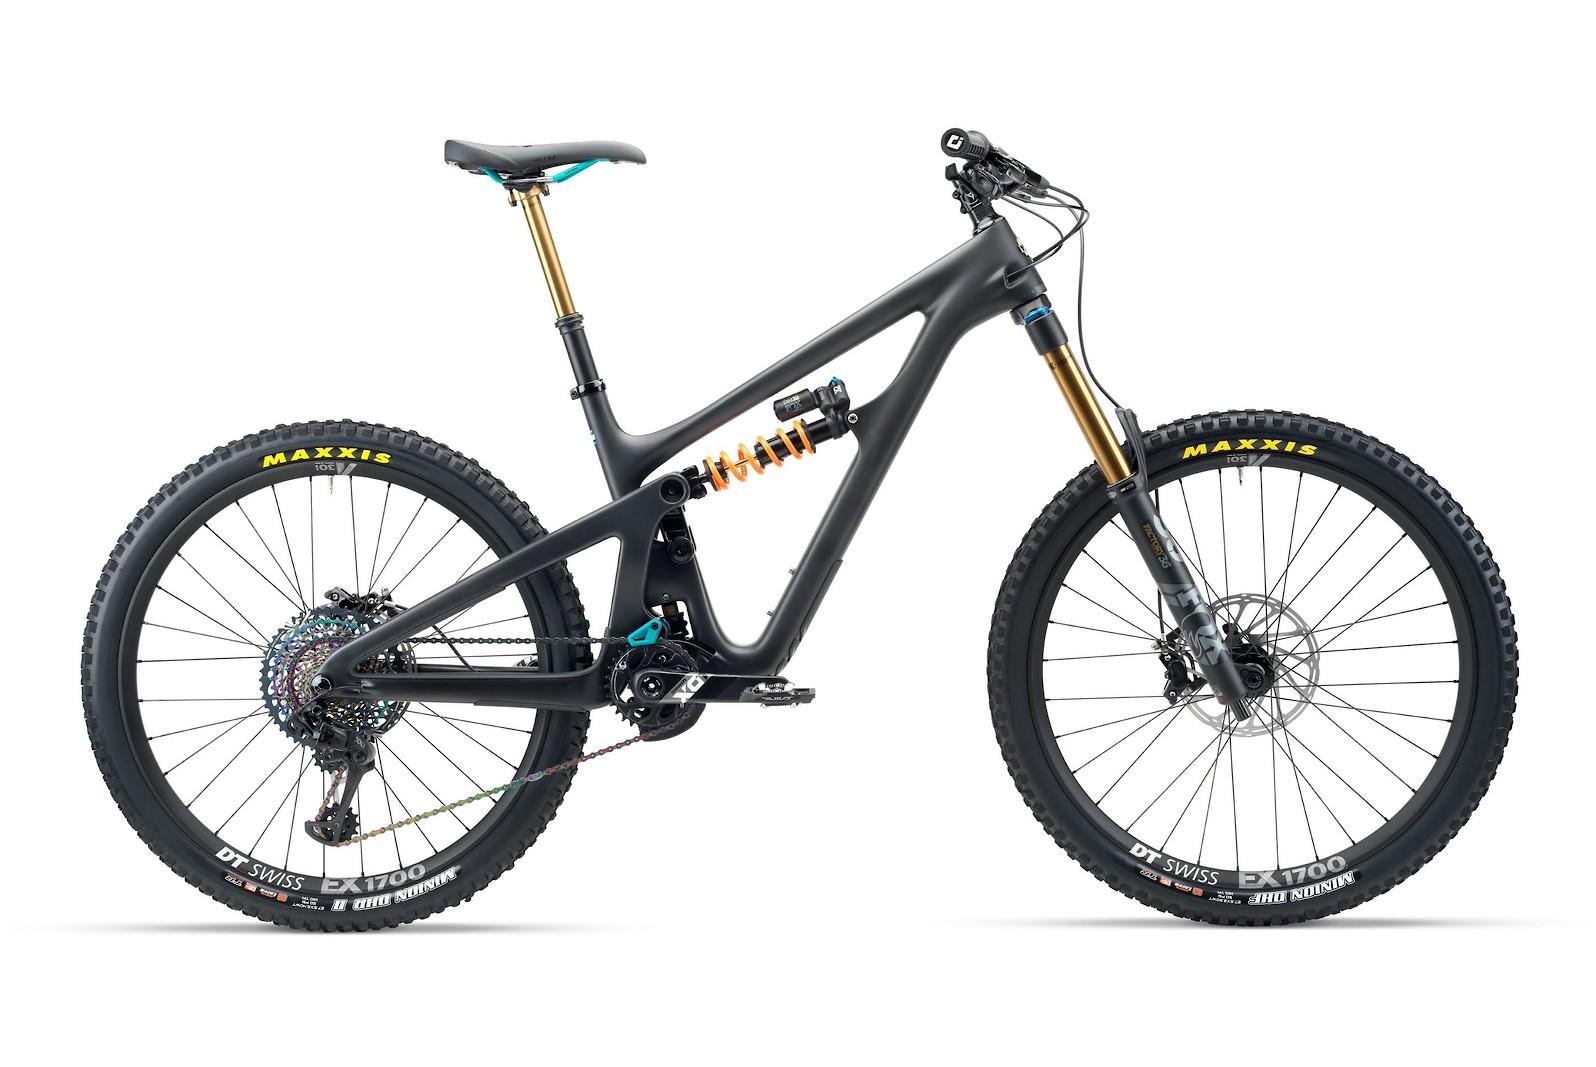 2020 Yeti SB165 Black - T3 Version Shown